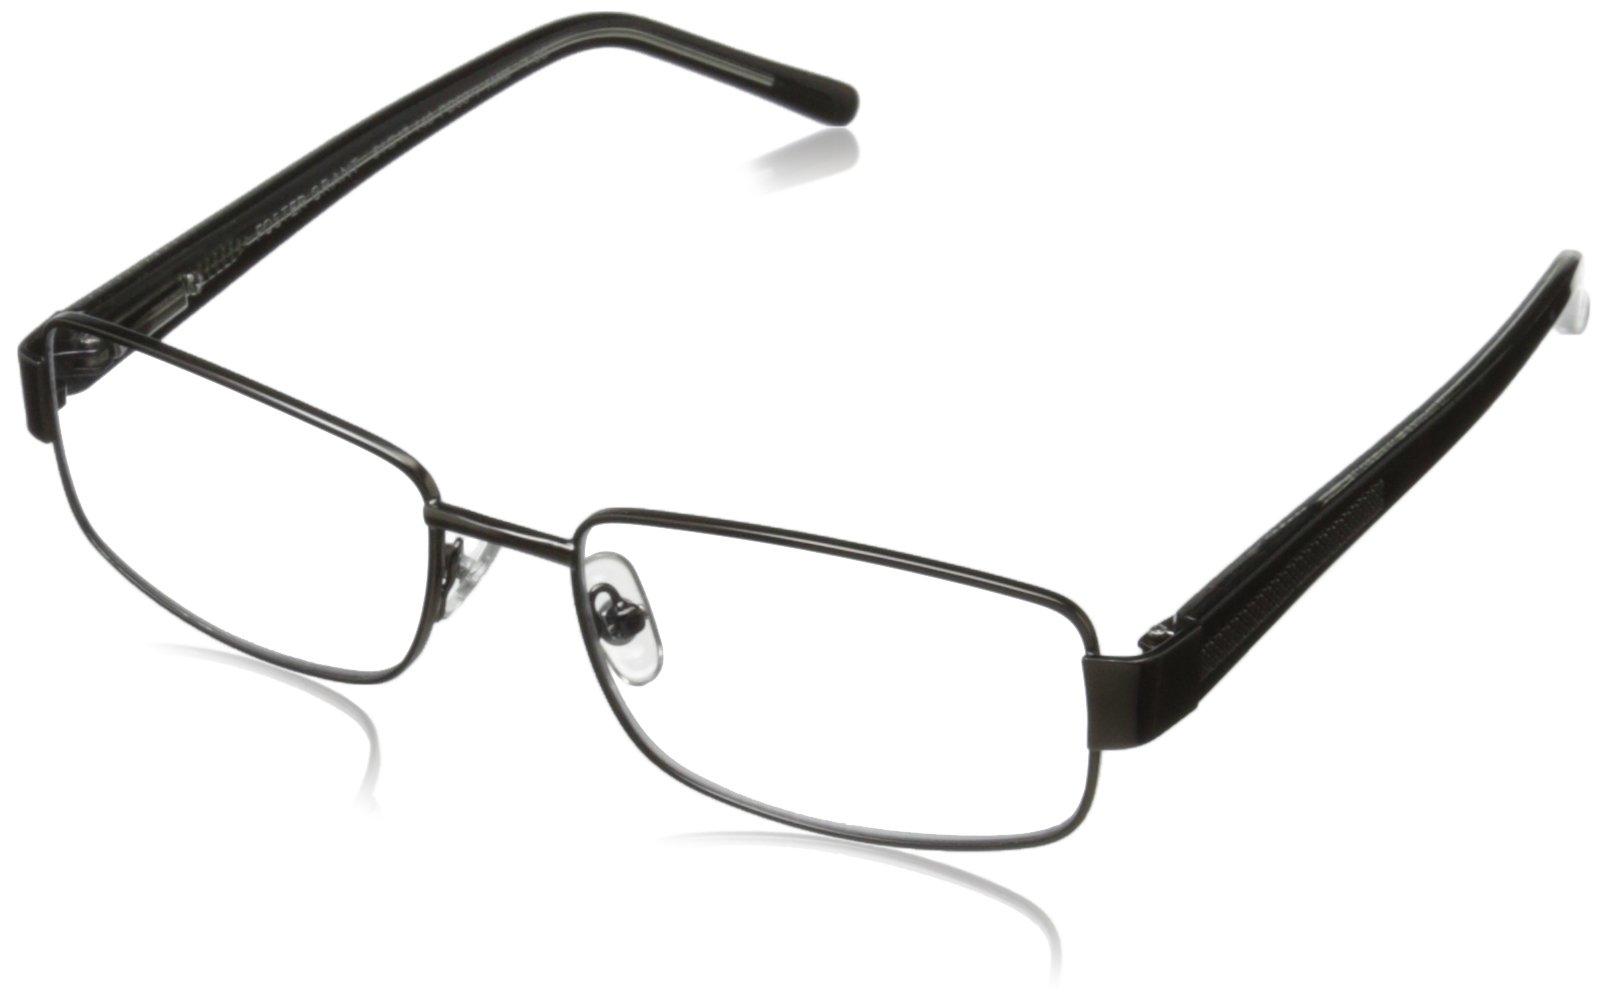 Foster Grant Wes Men's Multifocus Glasses, Gunmetal, 2.5